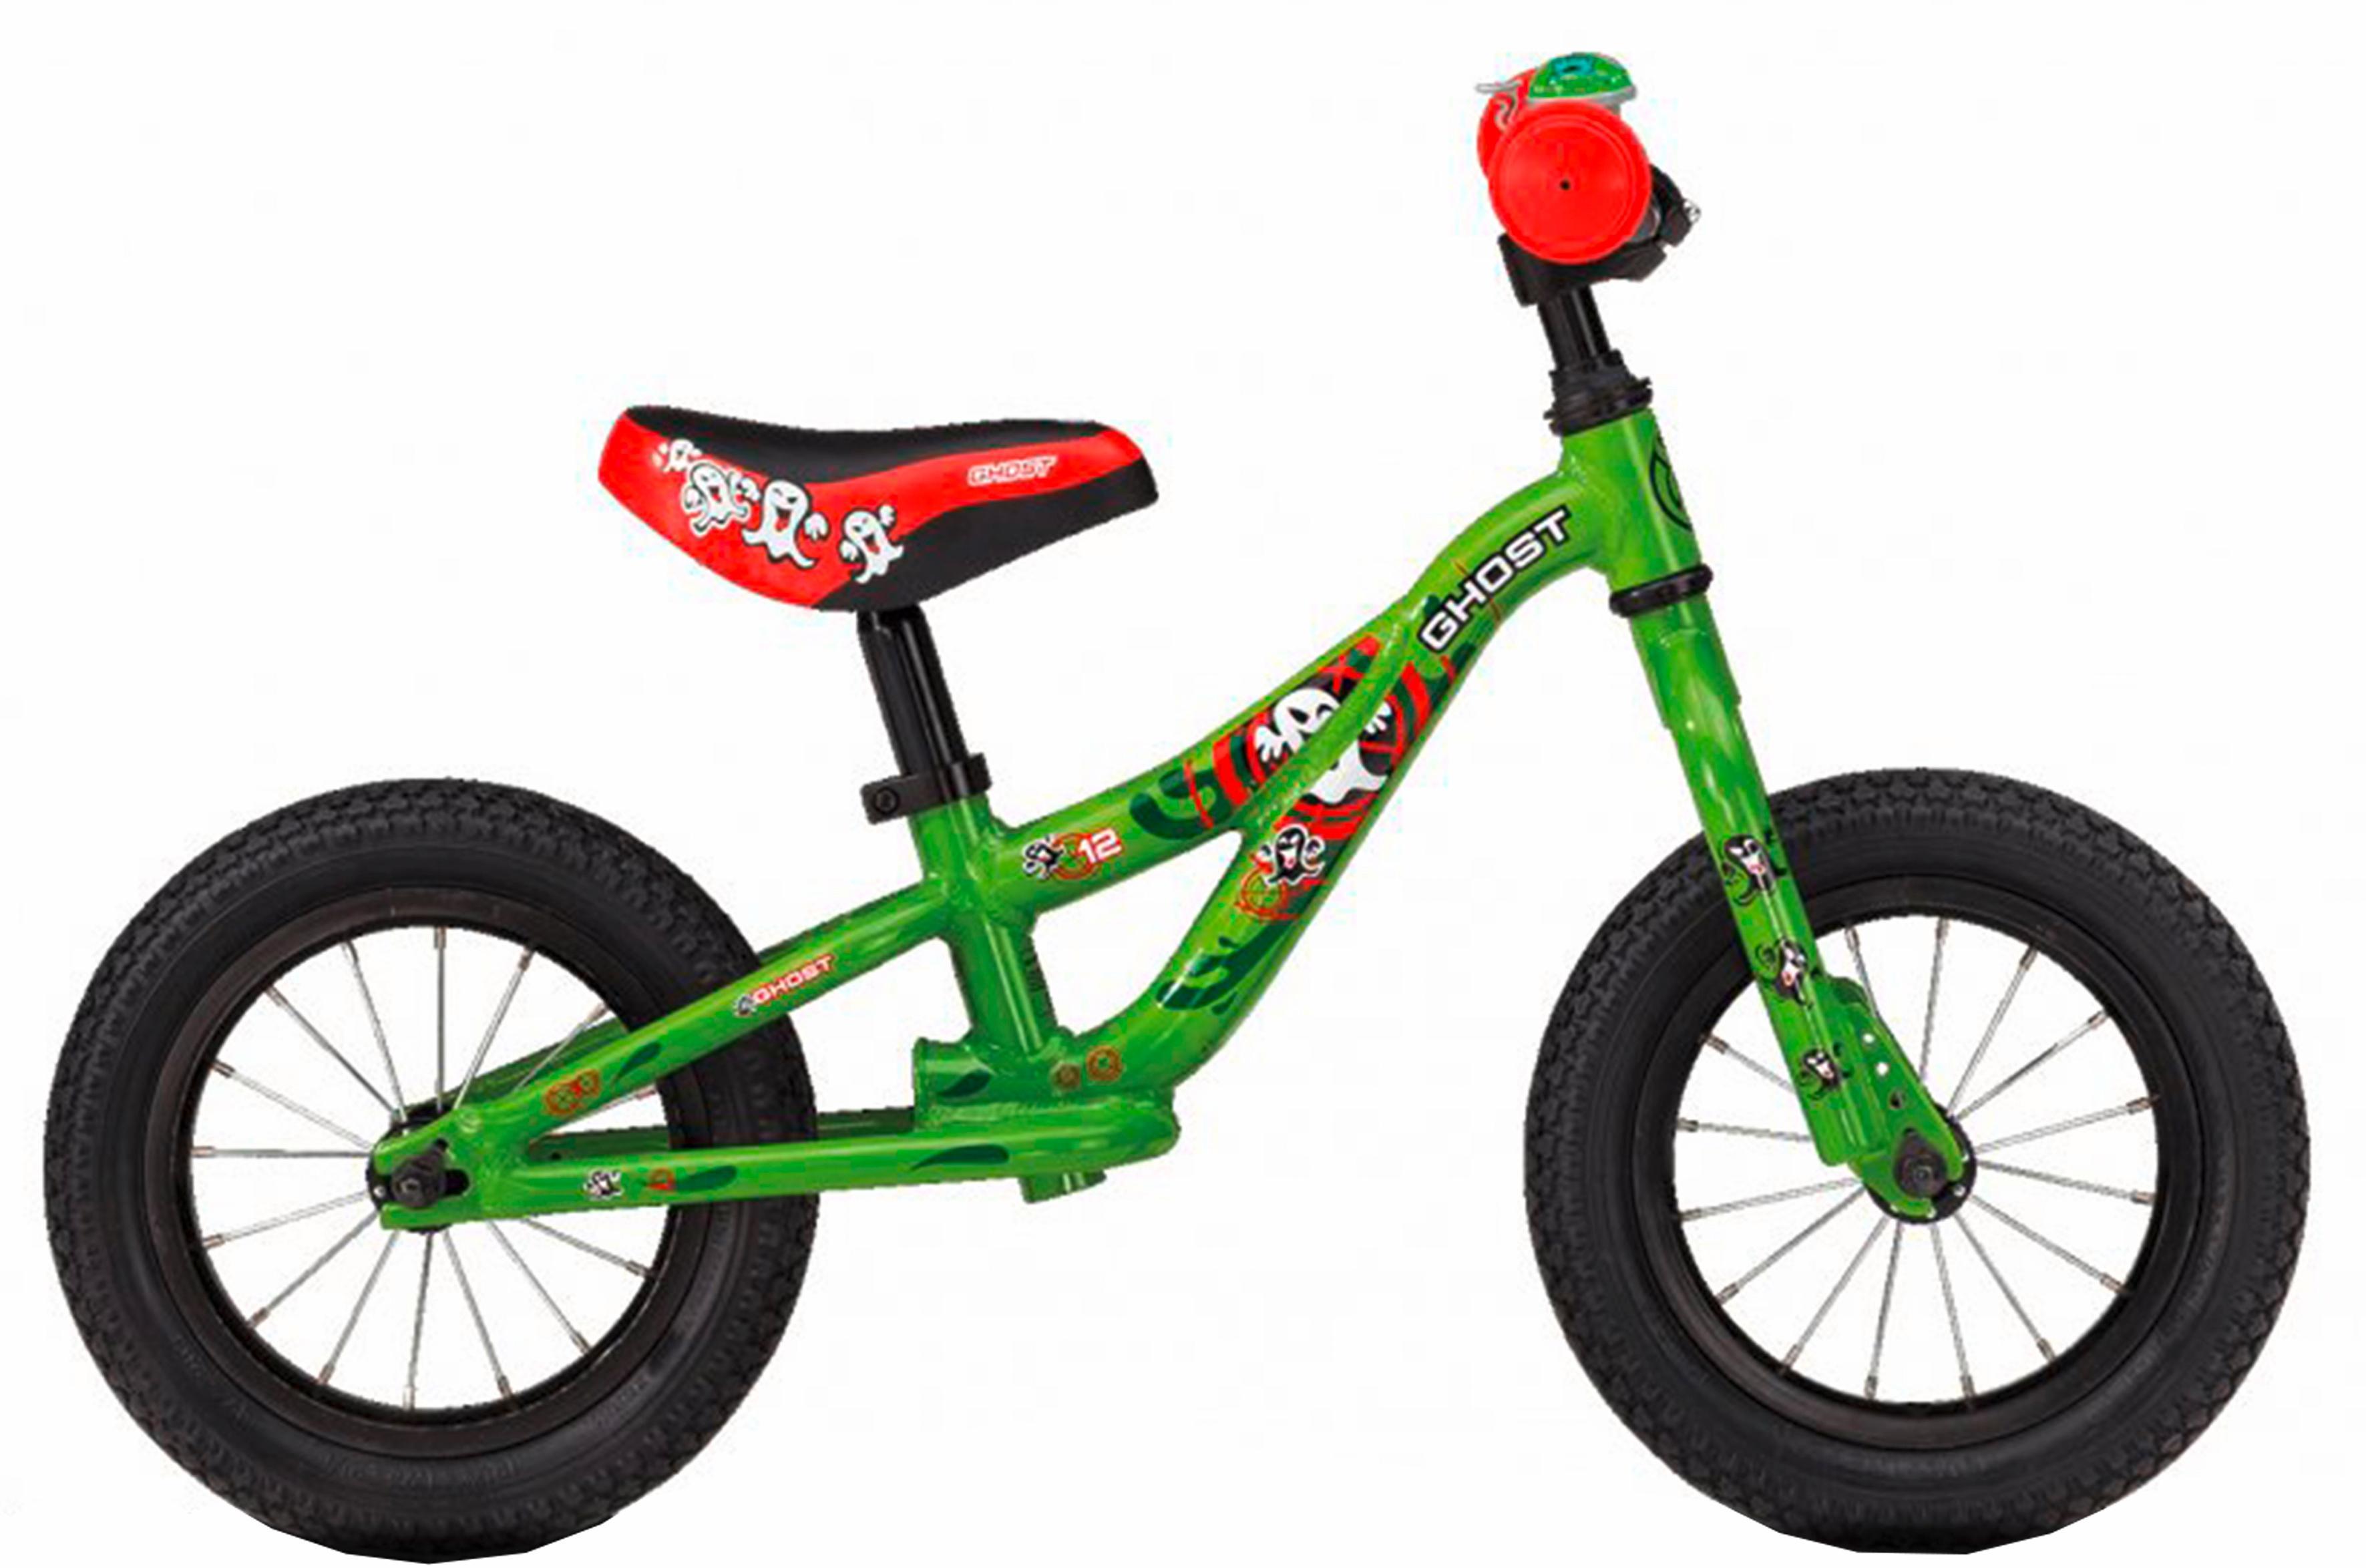 Ghost Kinderfahrrad POWERKIDDY AL 12 K grün Kinder Kinderfahrräder Fahrräder Zubehör Fahrrad